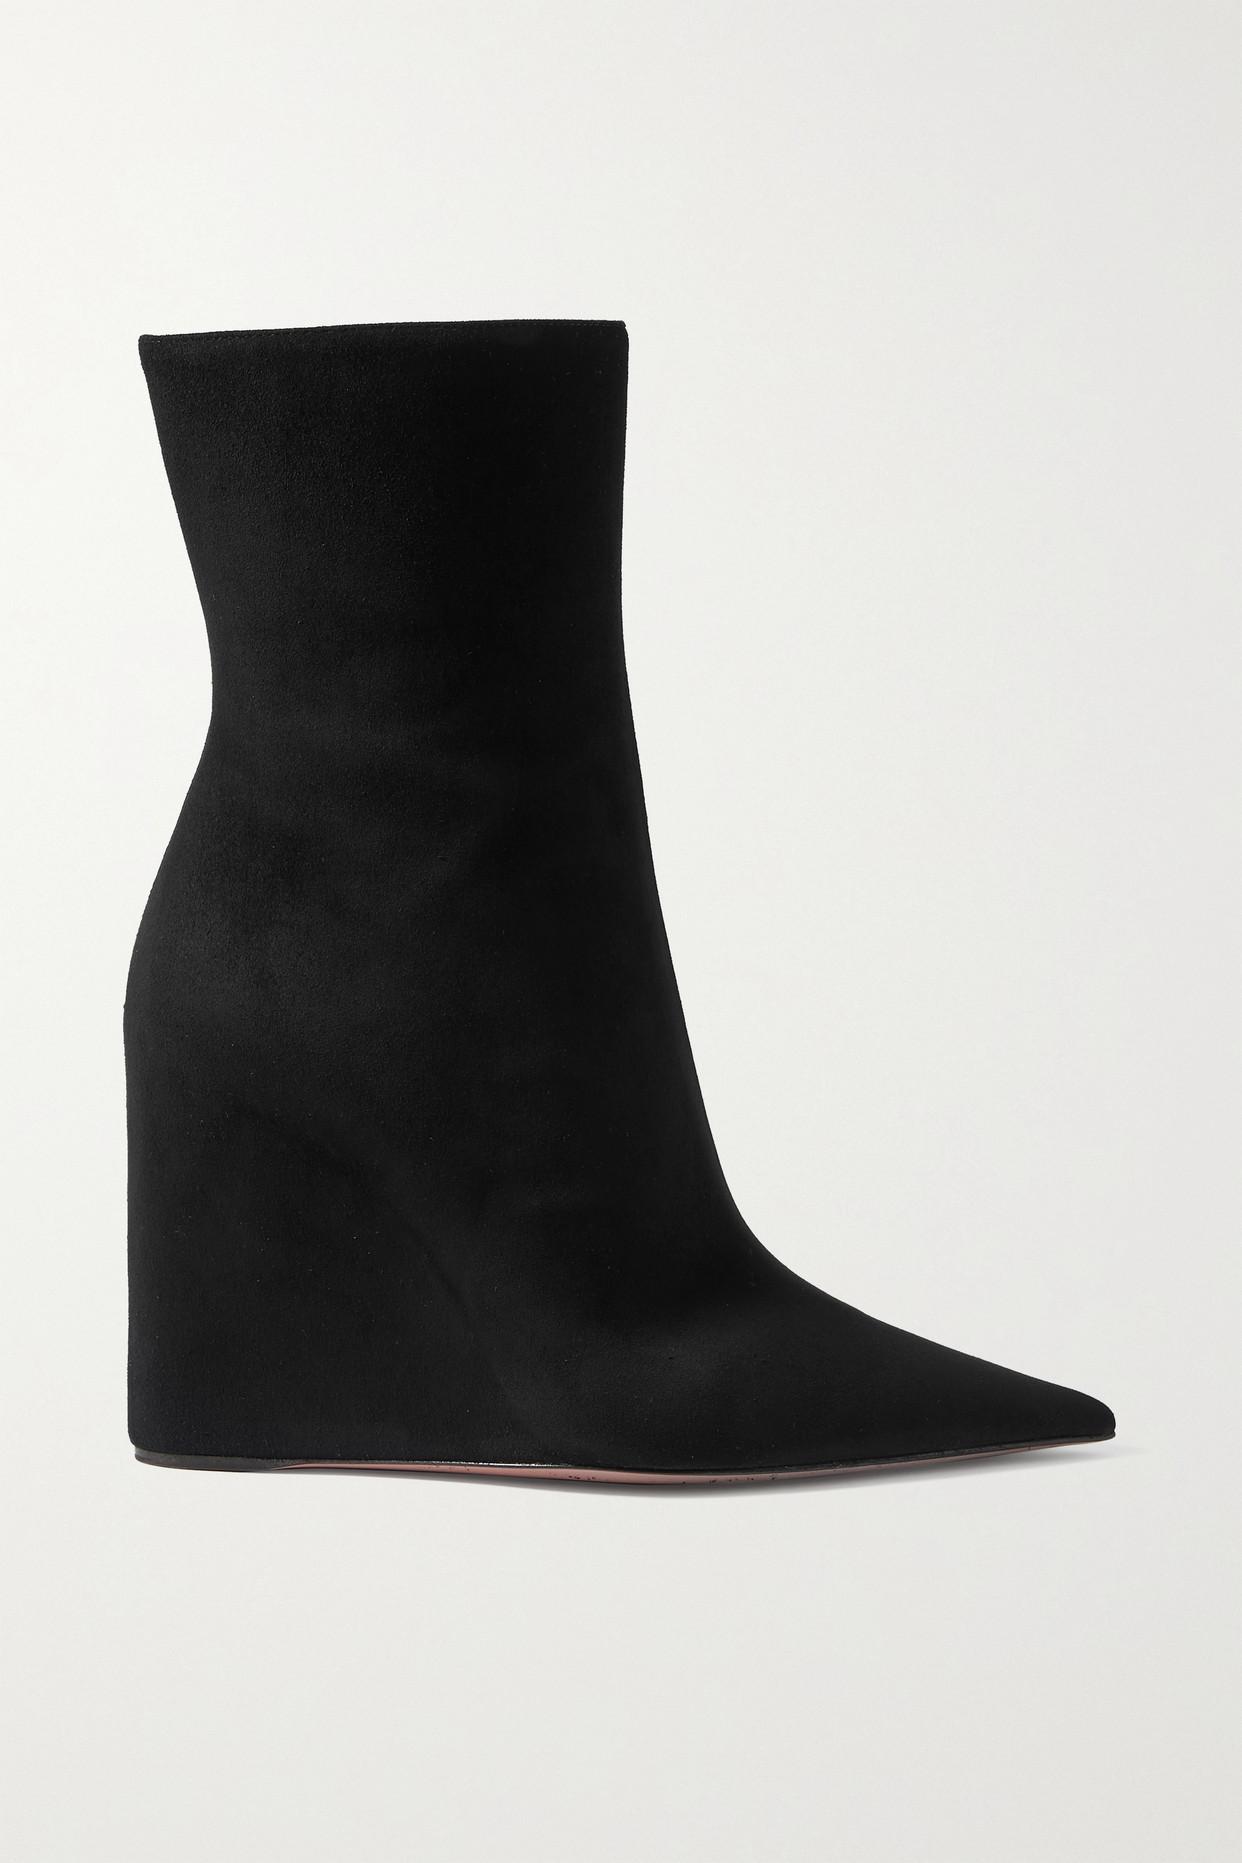 AMINA MUADDI - Pernille 绒面革坡跟踝靴 - 黑色 - IT41